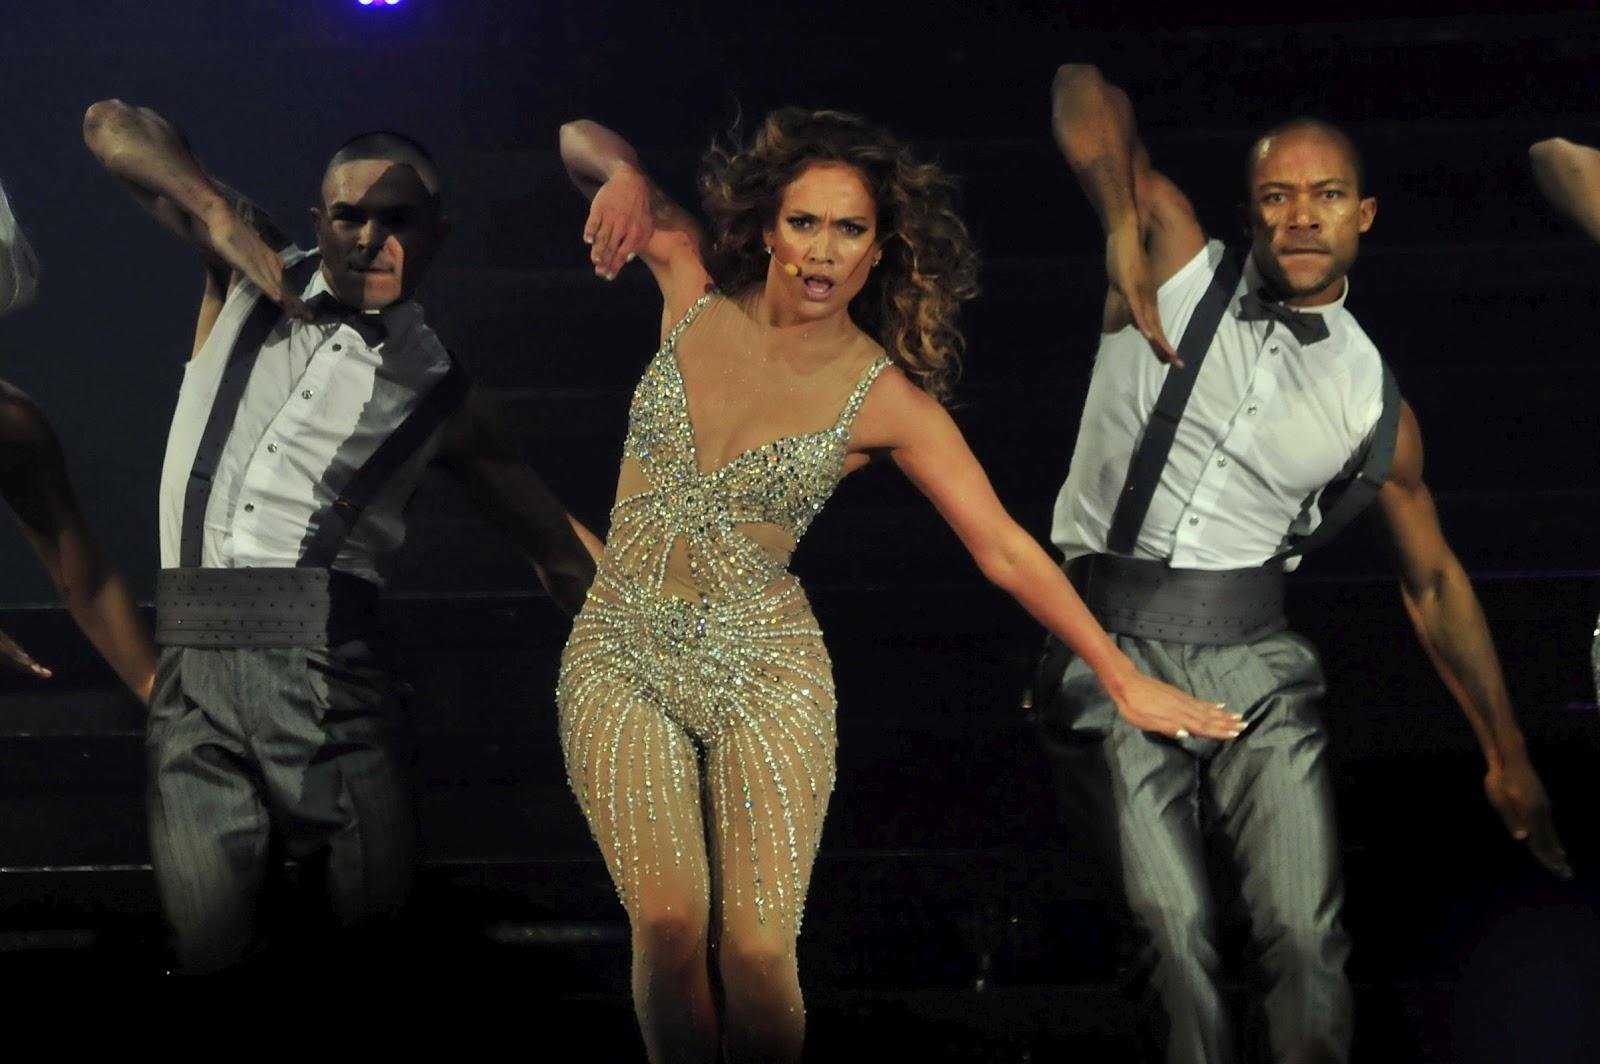 http://3.bp.blogspot.com/-LDB7esZLCqU/T9zPqC4ZyeI/AAAAAAAAJ9k/Xvn1_KcmdO0/s1600/Jennifer-Lopez-Performs-Live-in-Panama-City-7.jpg